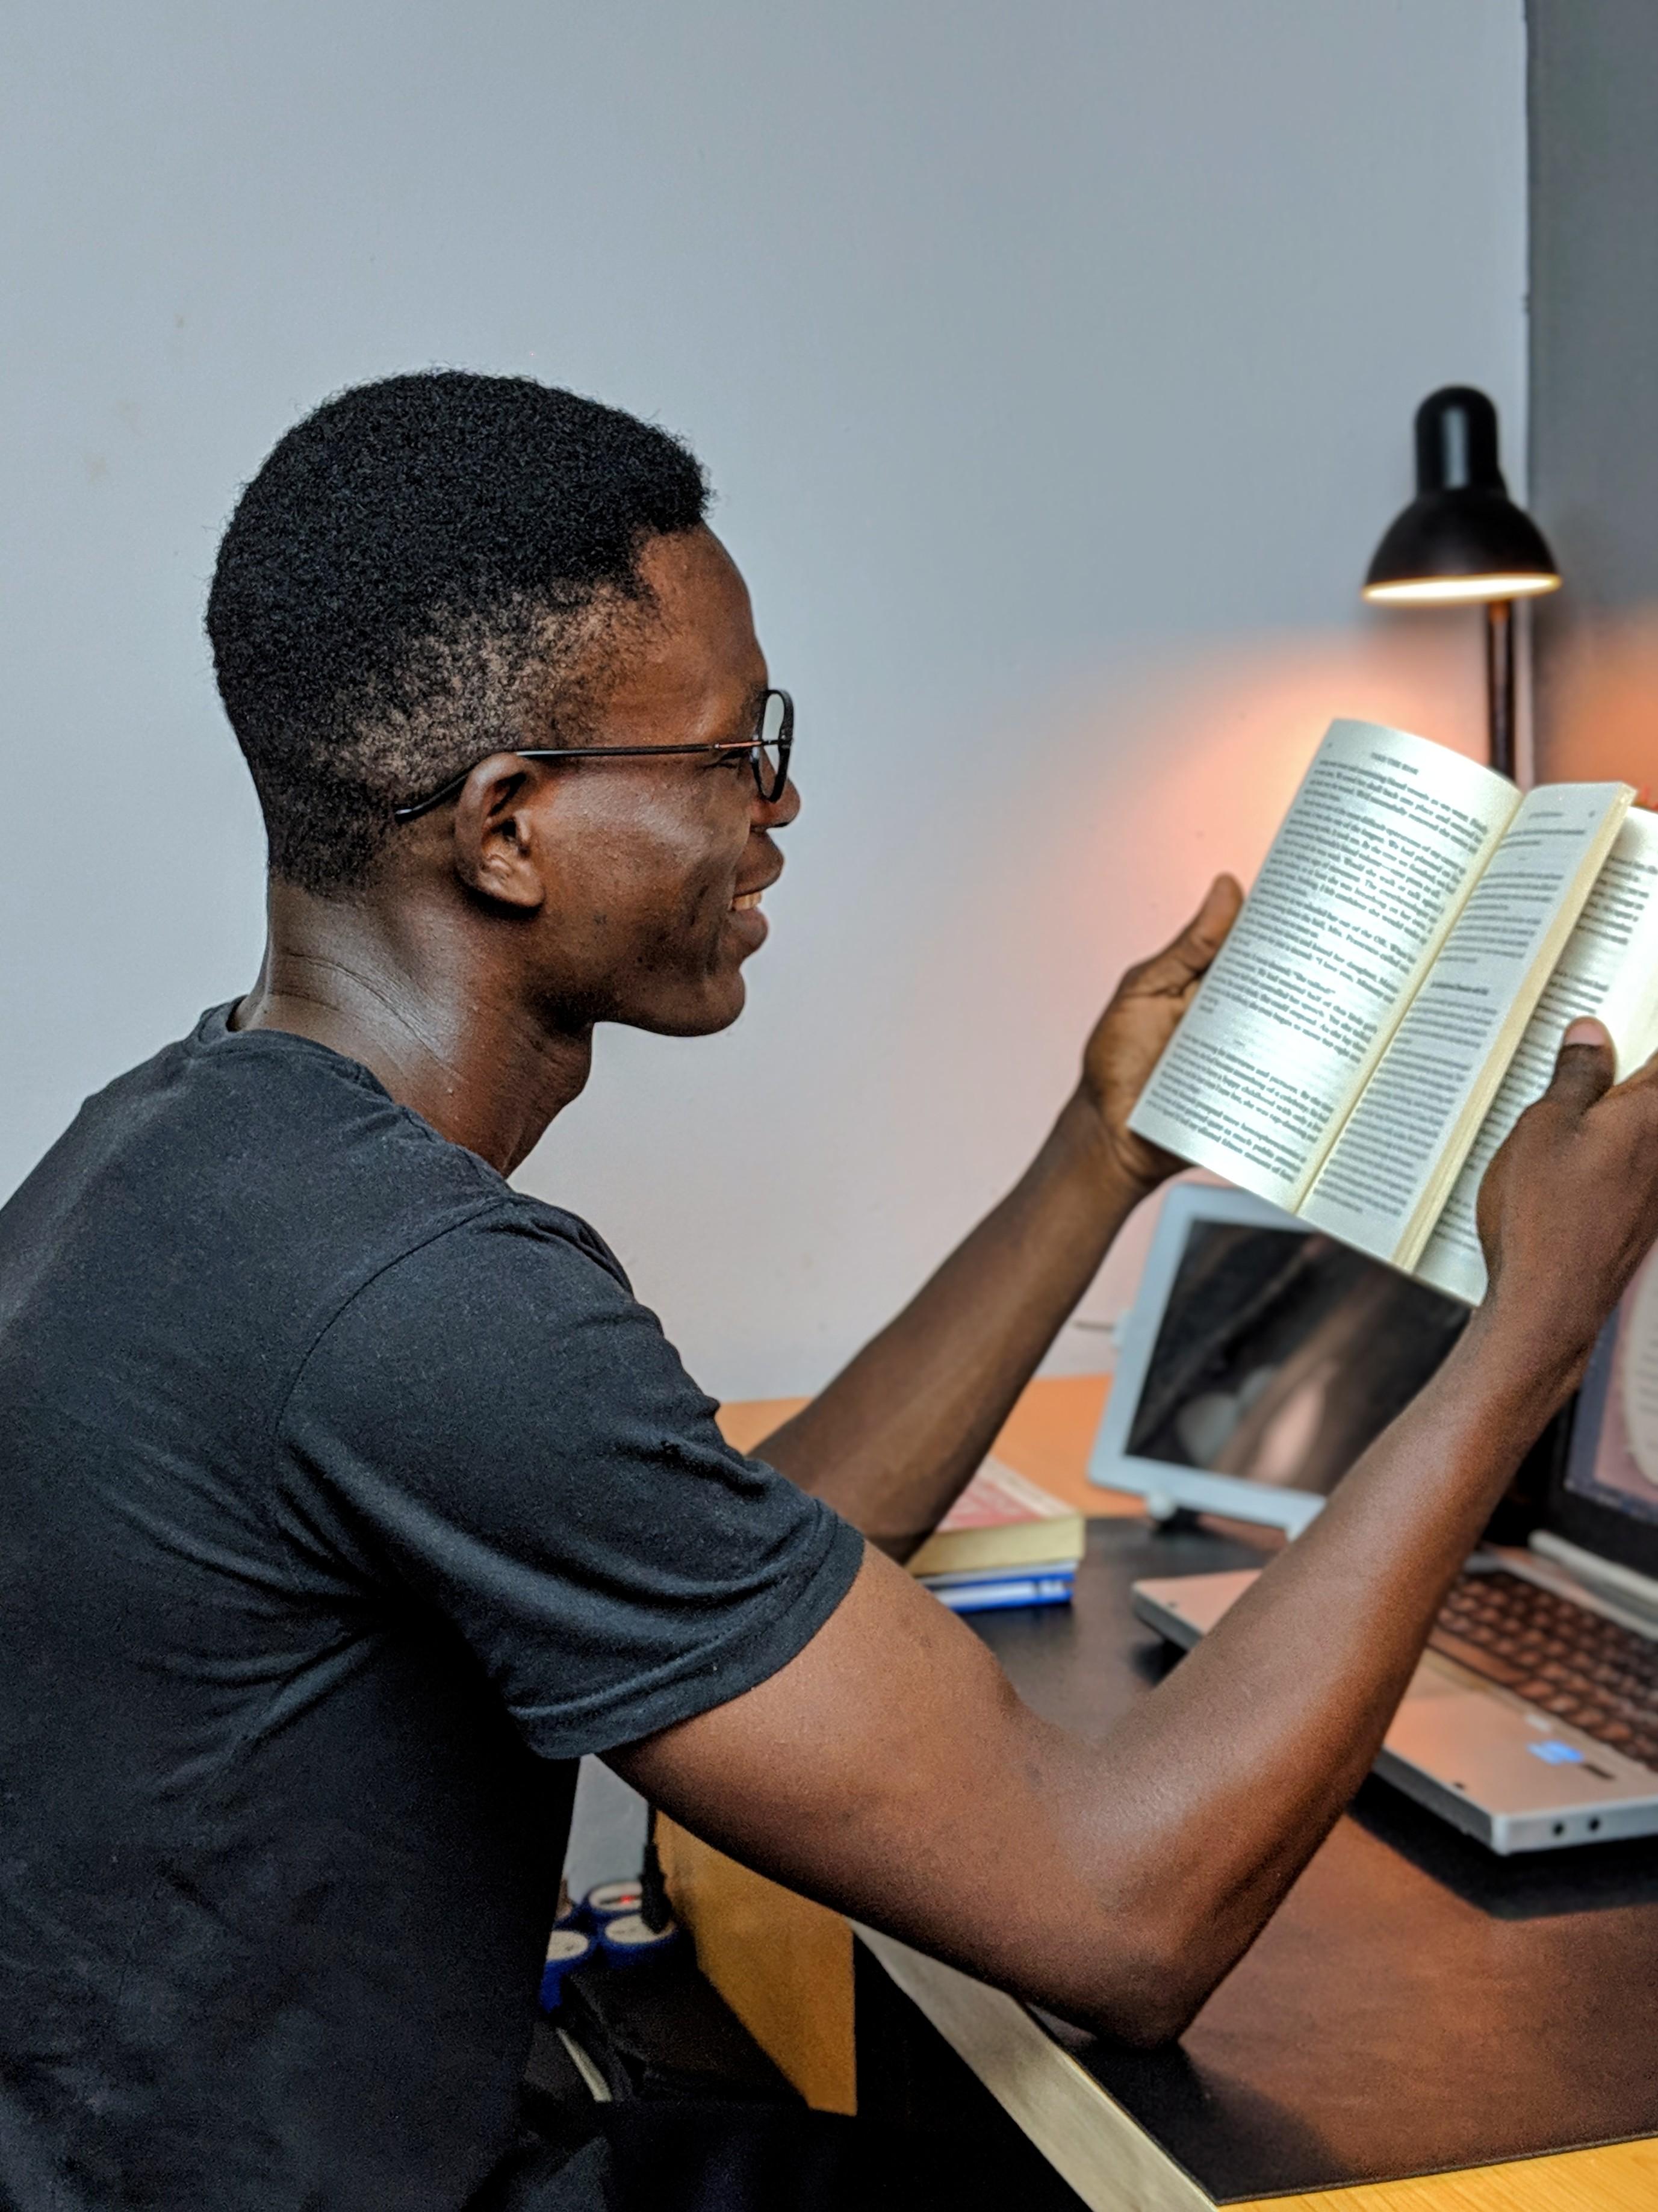 Man Wearing Gray Crew-neck Shirt Holding Book